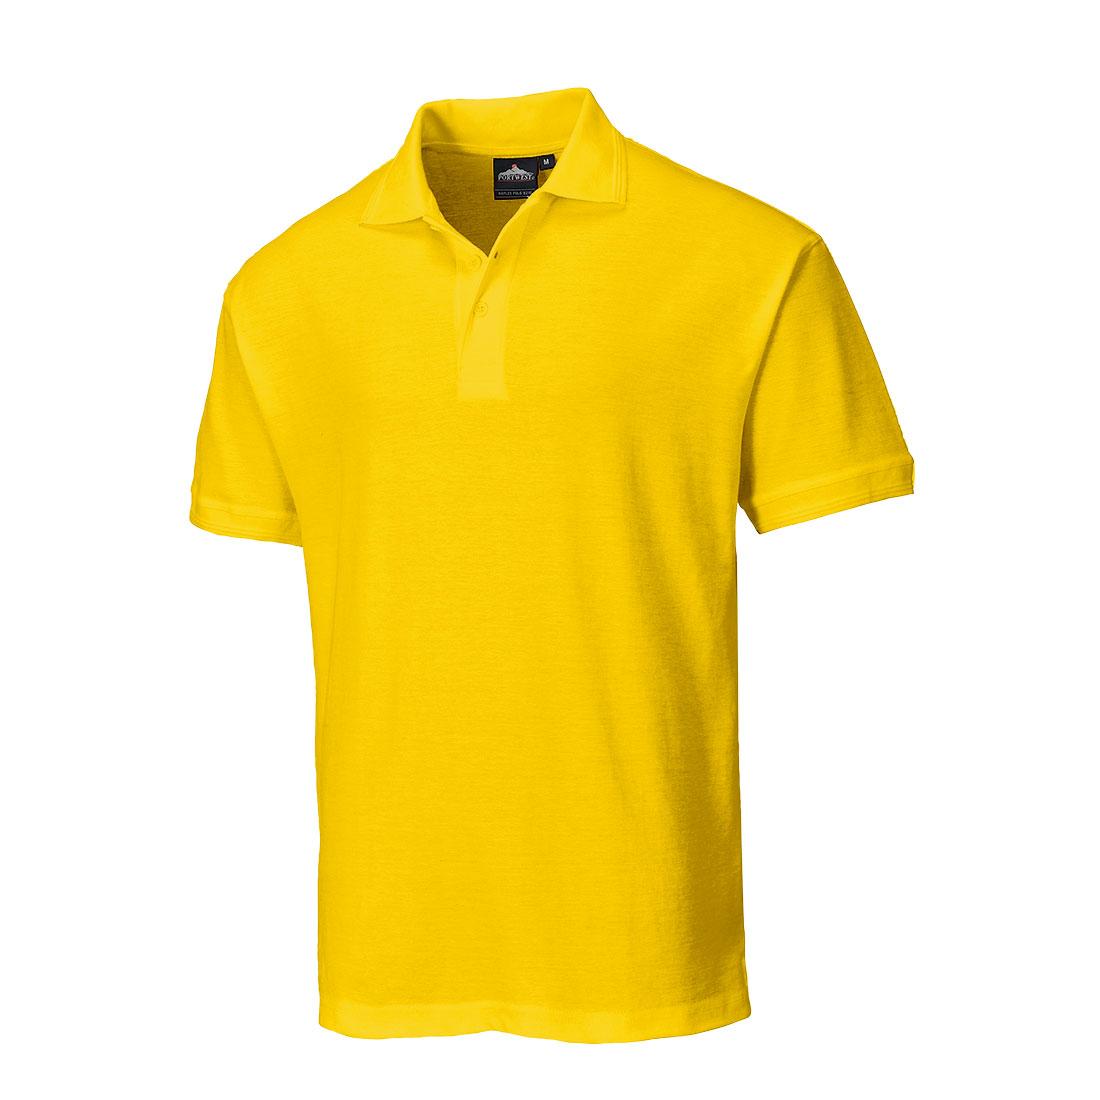 Naples Polo Shirt Yellow MR